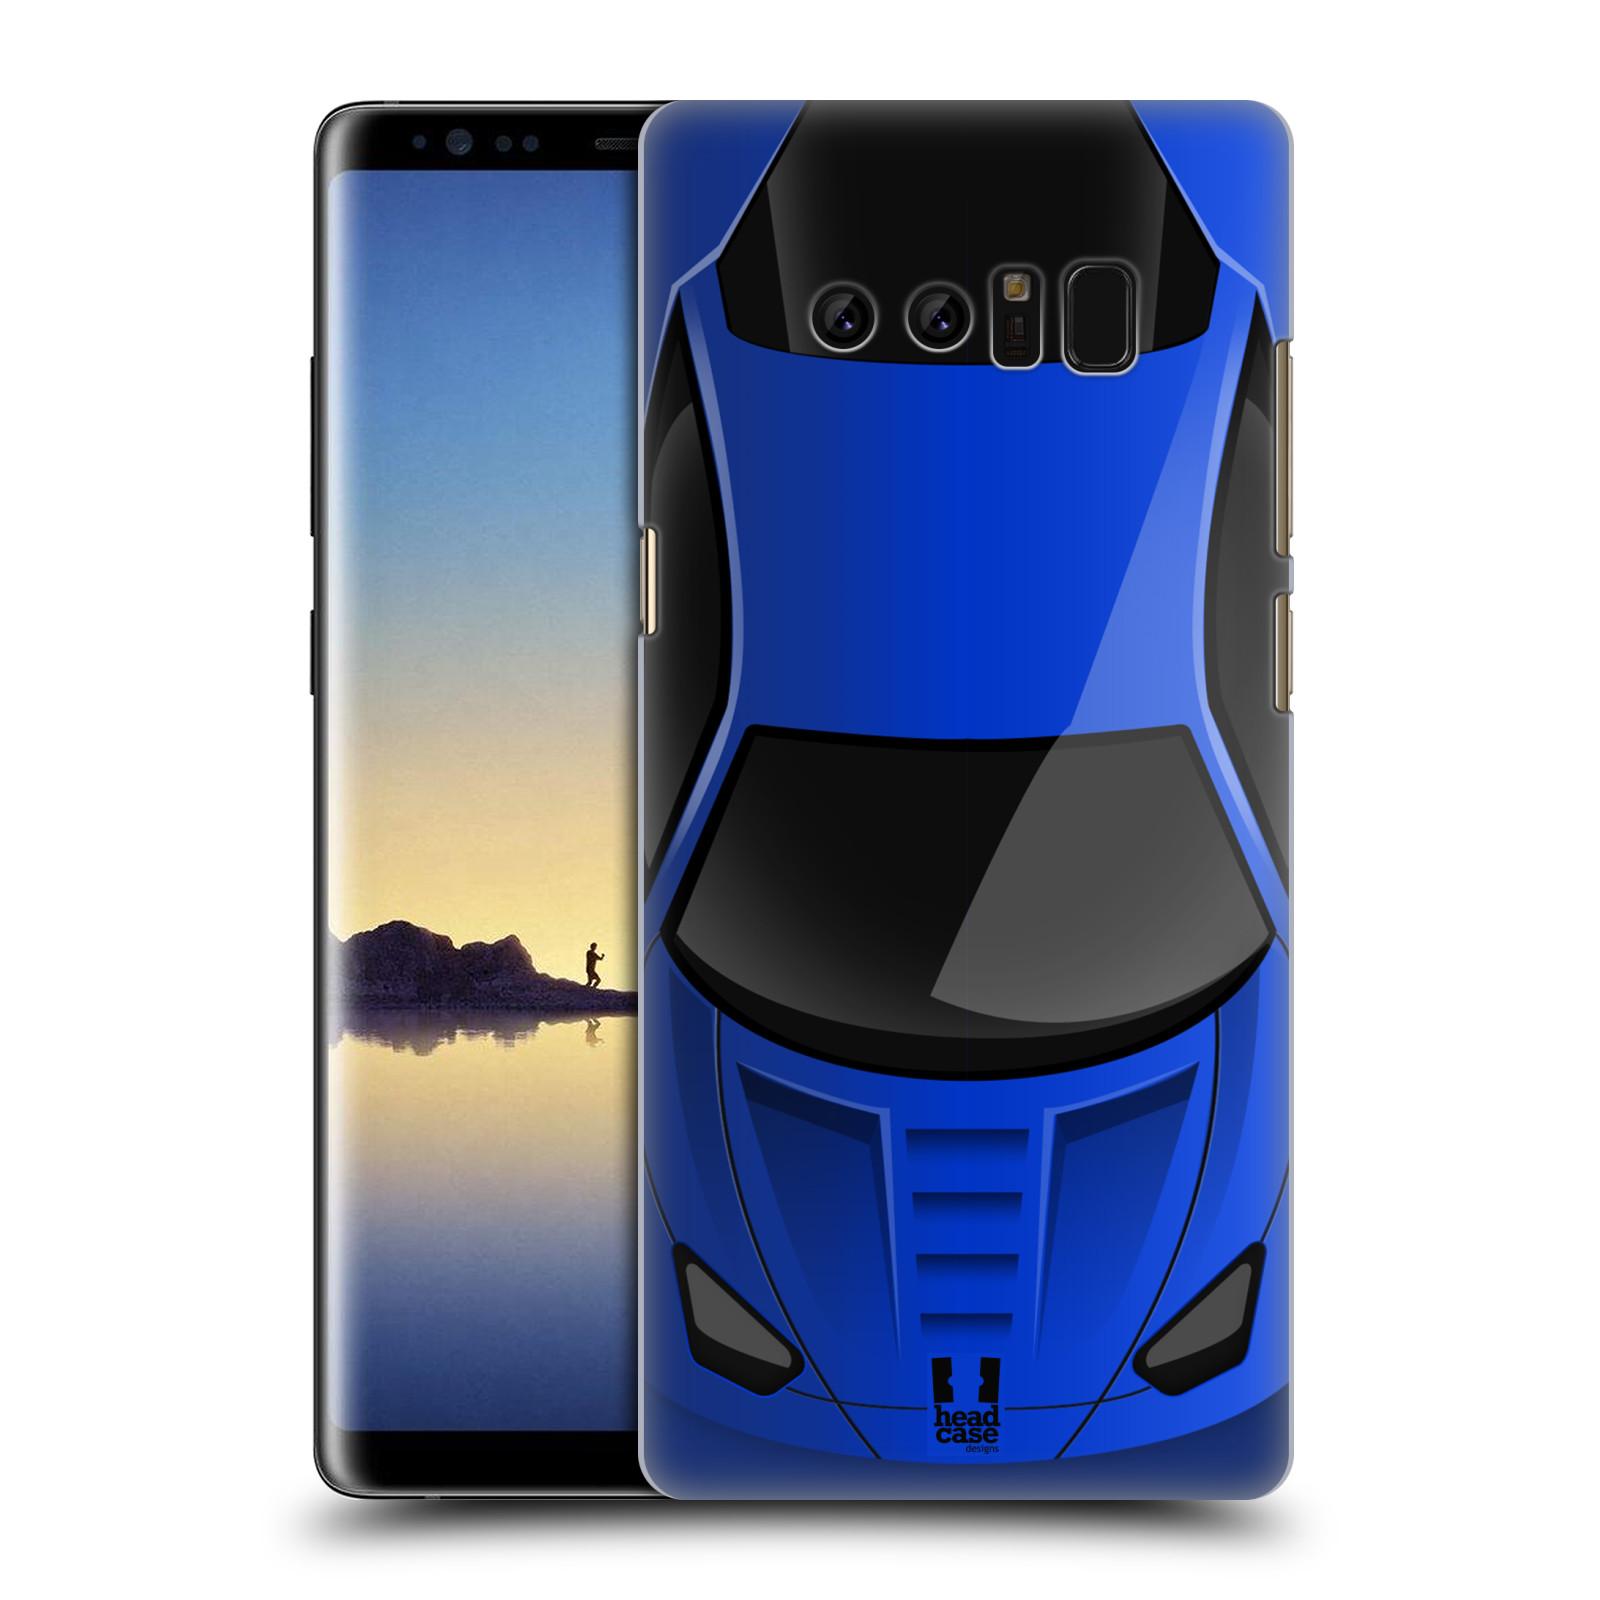 Plastové pouzdro na mobil Samsung Galaxy Note 8 - Head Case - AUTO MODRÉ (Plastový kryt či obal na mobilní telefon Samsung Galaxy Note 8 SM-N950 s motivem AUTO MODRÉ)